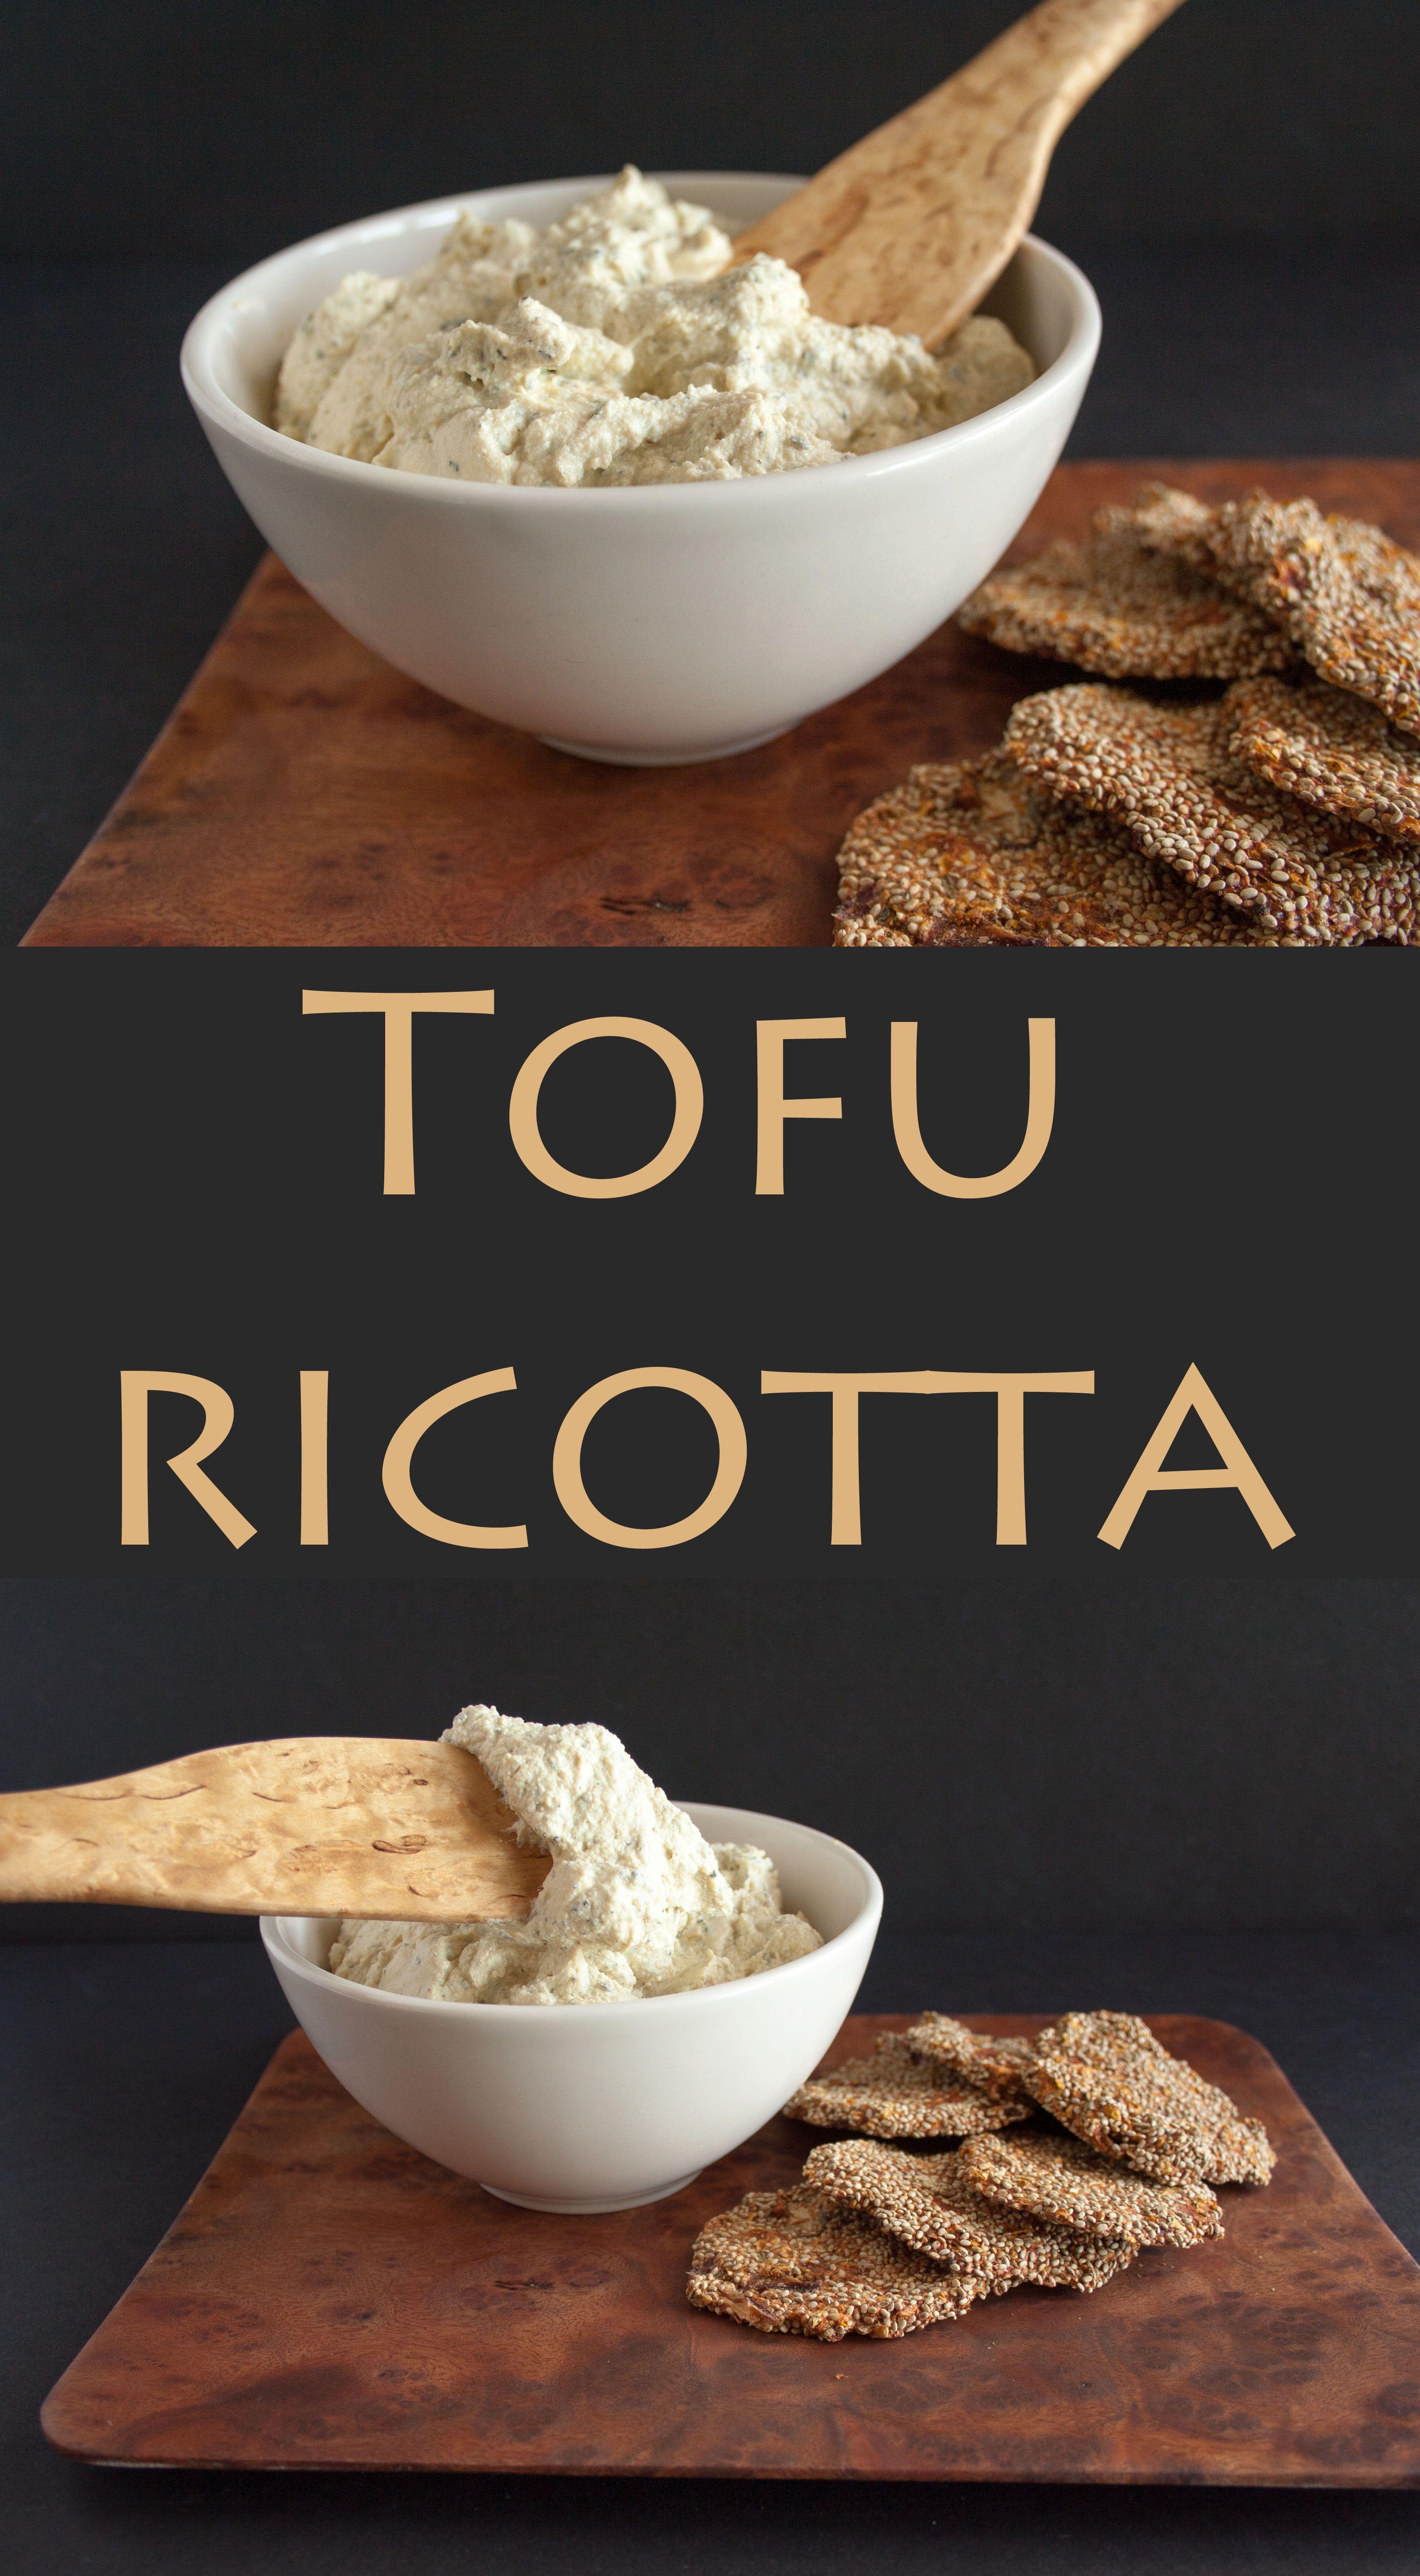 Tofu Ricotta (vegan, gluten free) This easy recipe is